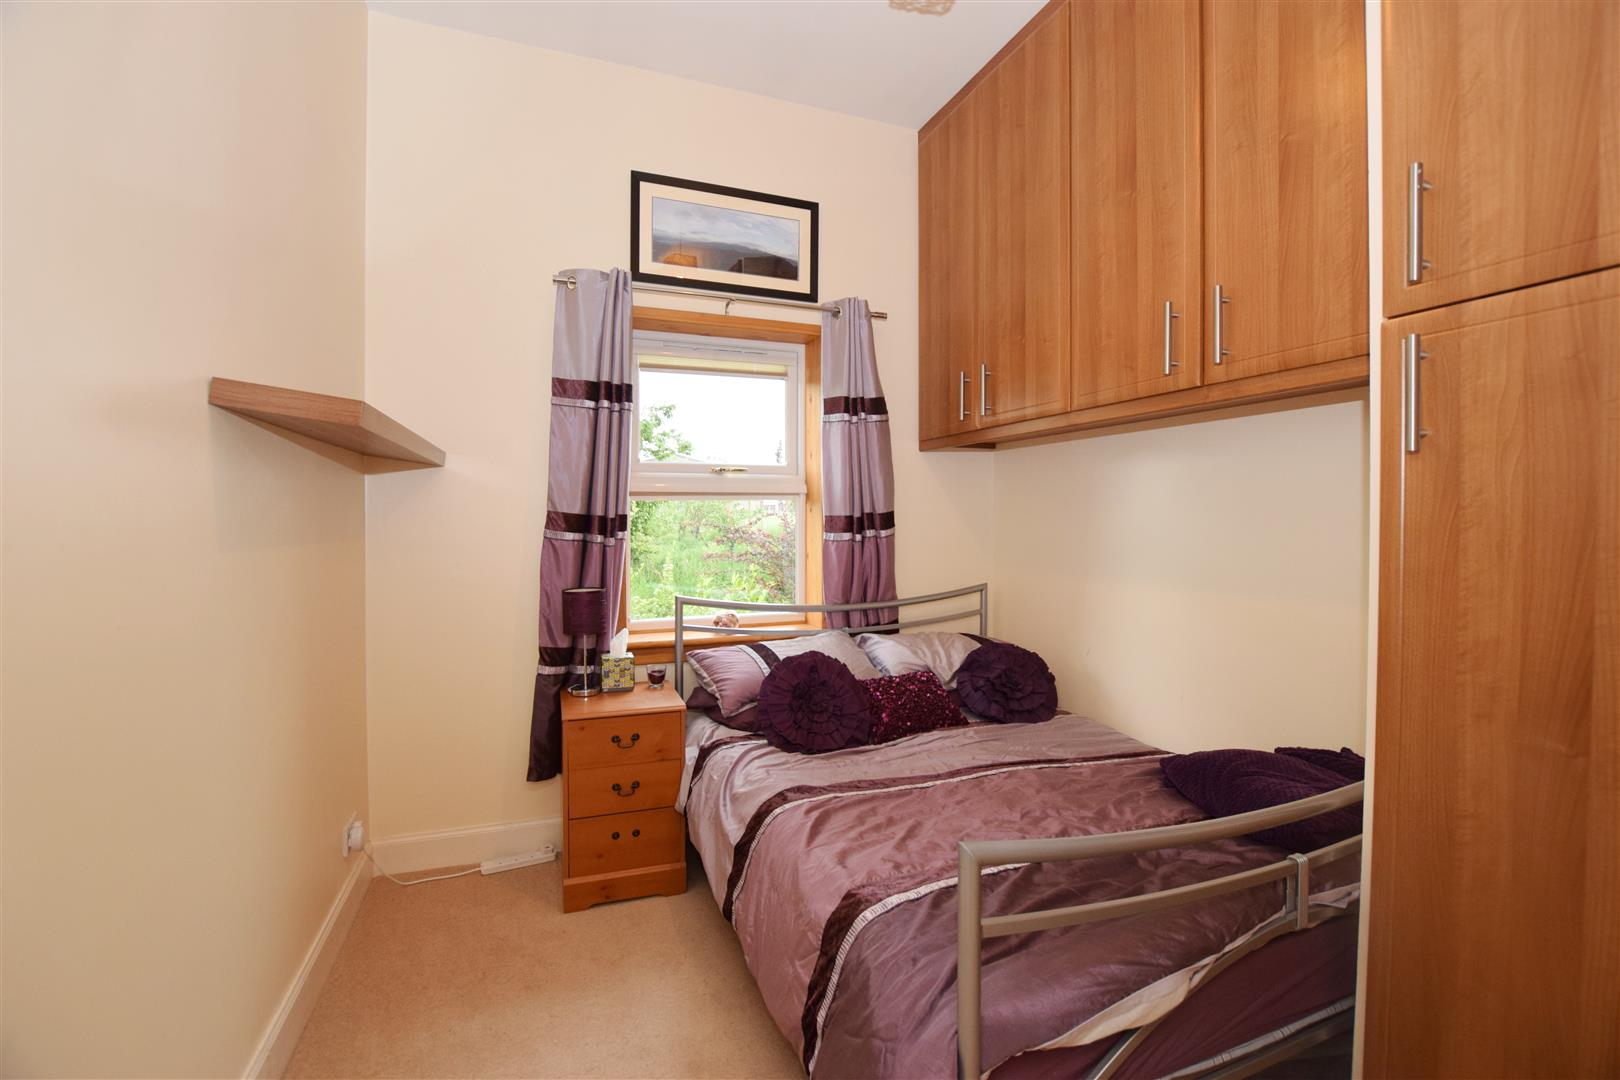 Cottage 2, Woodhead Of Mailer, Perth, Perthshire, PH2 0QA, UK